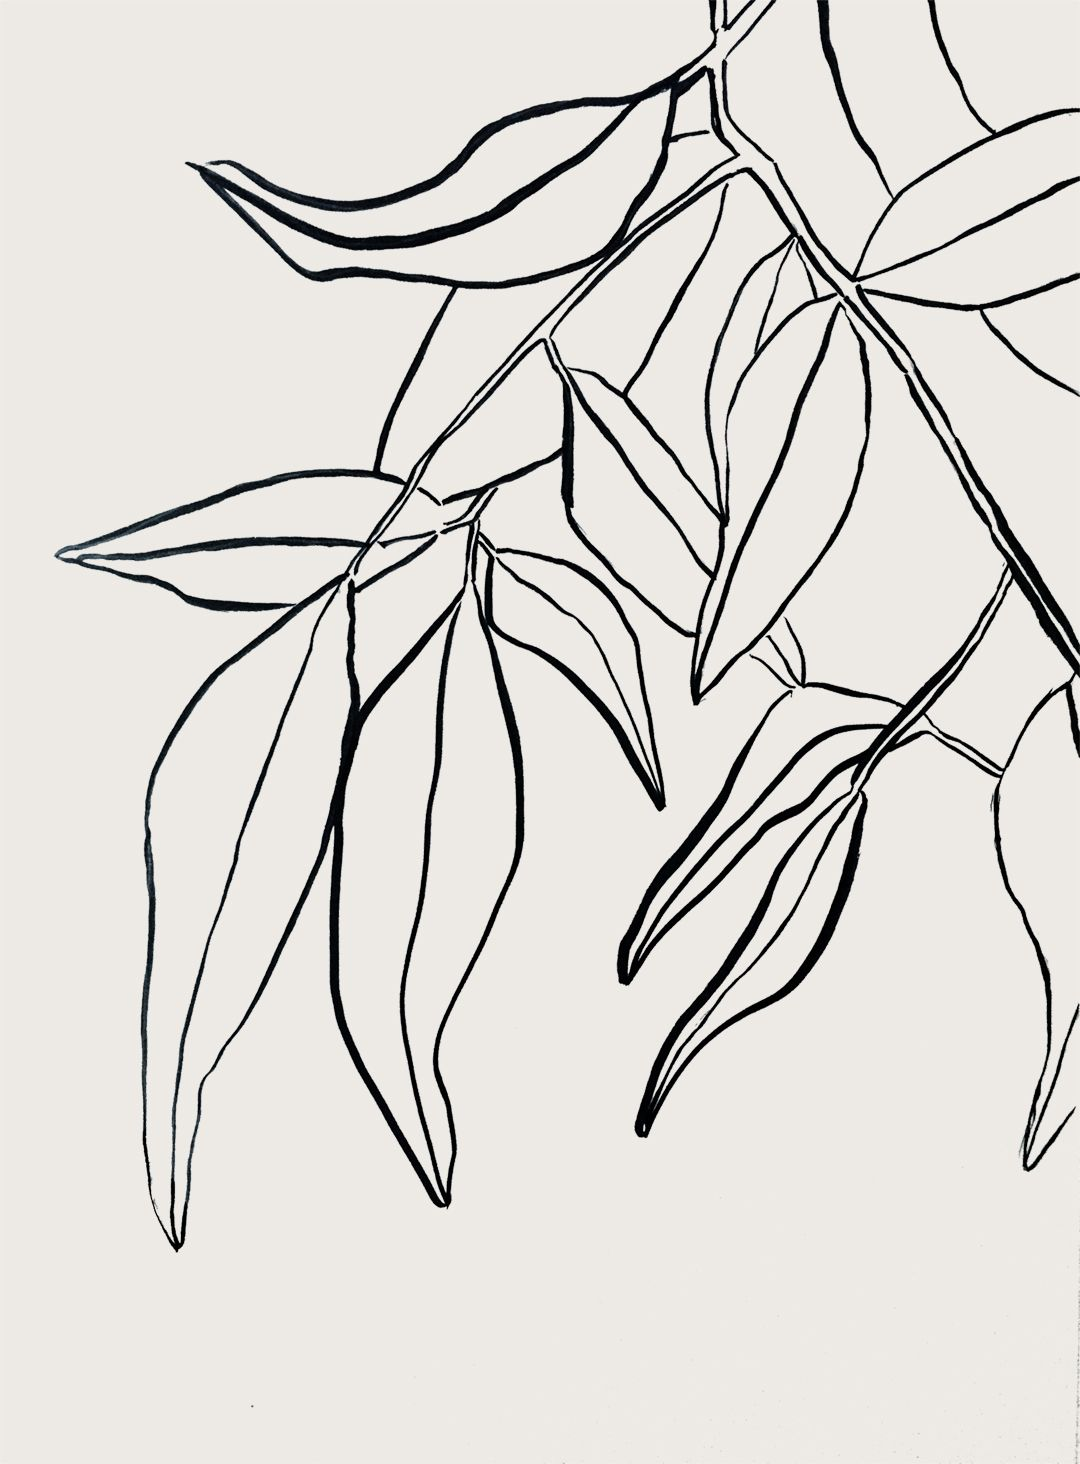 Botanical Leaves Drawing